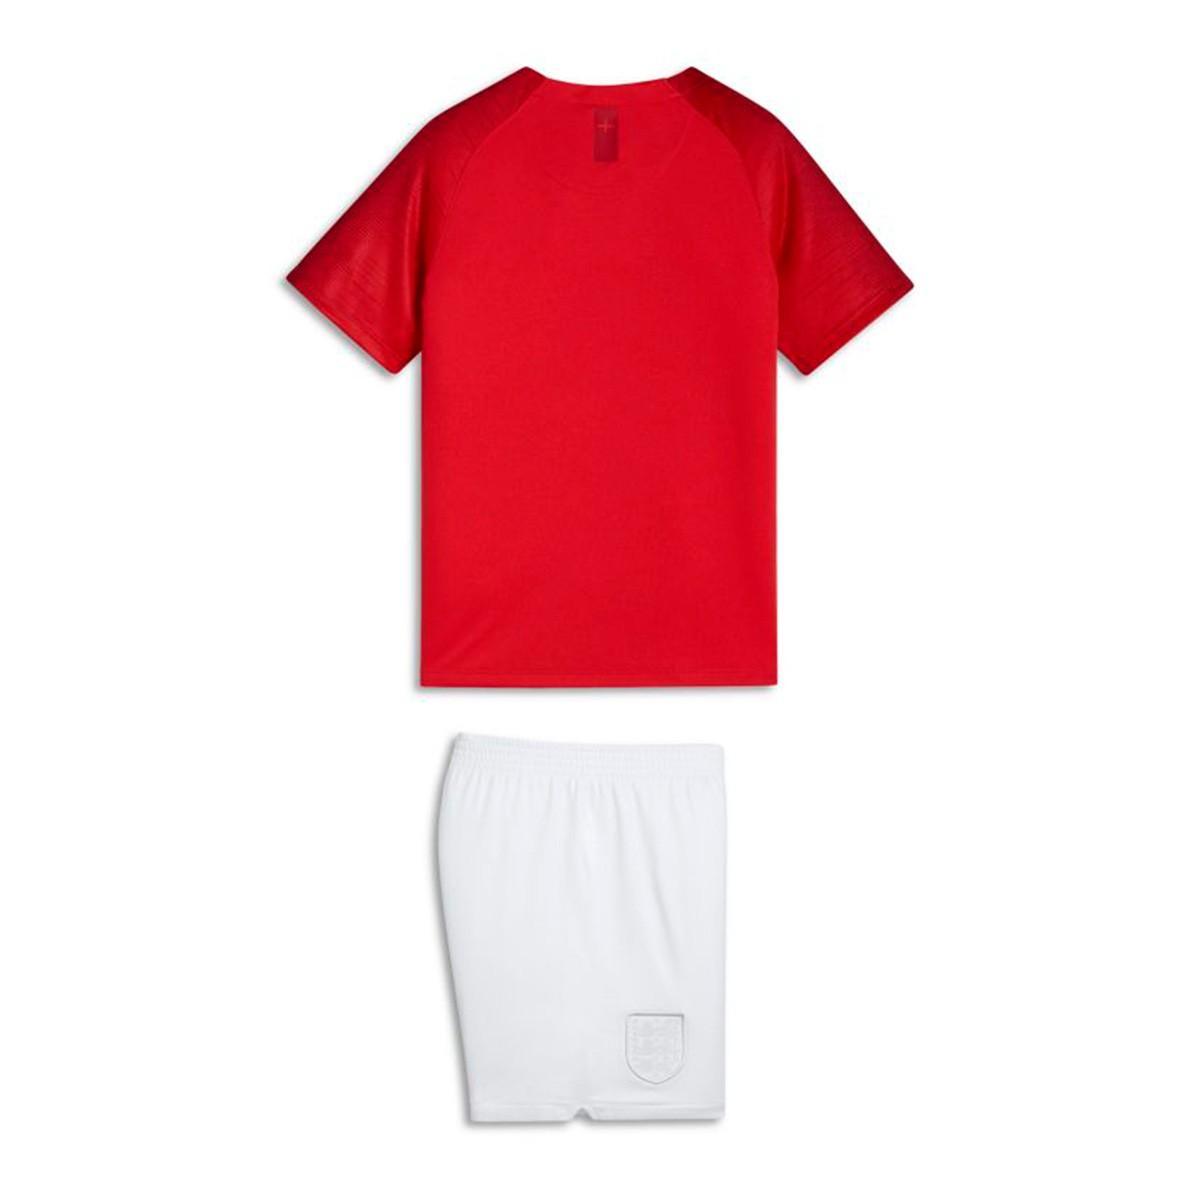 d639347d622d Kit Nike Kids England 2018-2019 Away Challenge red-White - Football ...